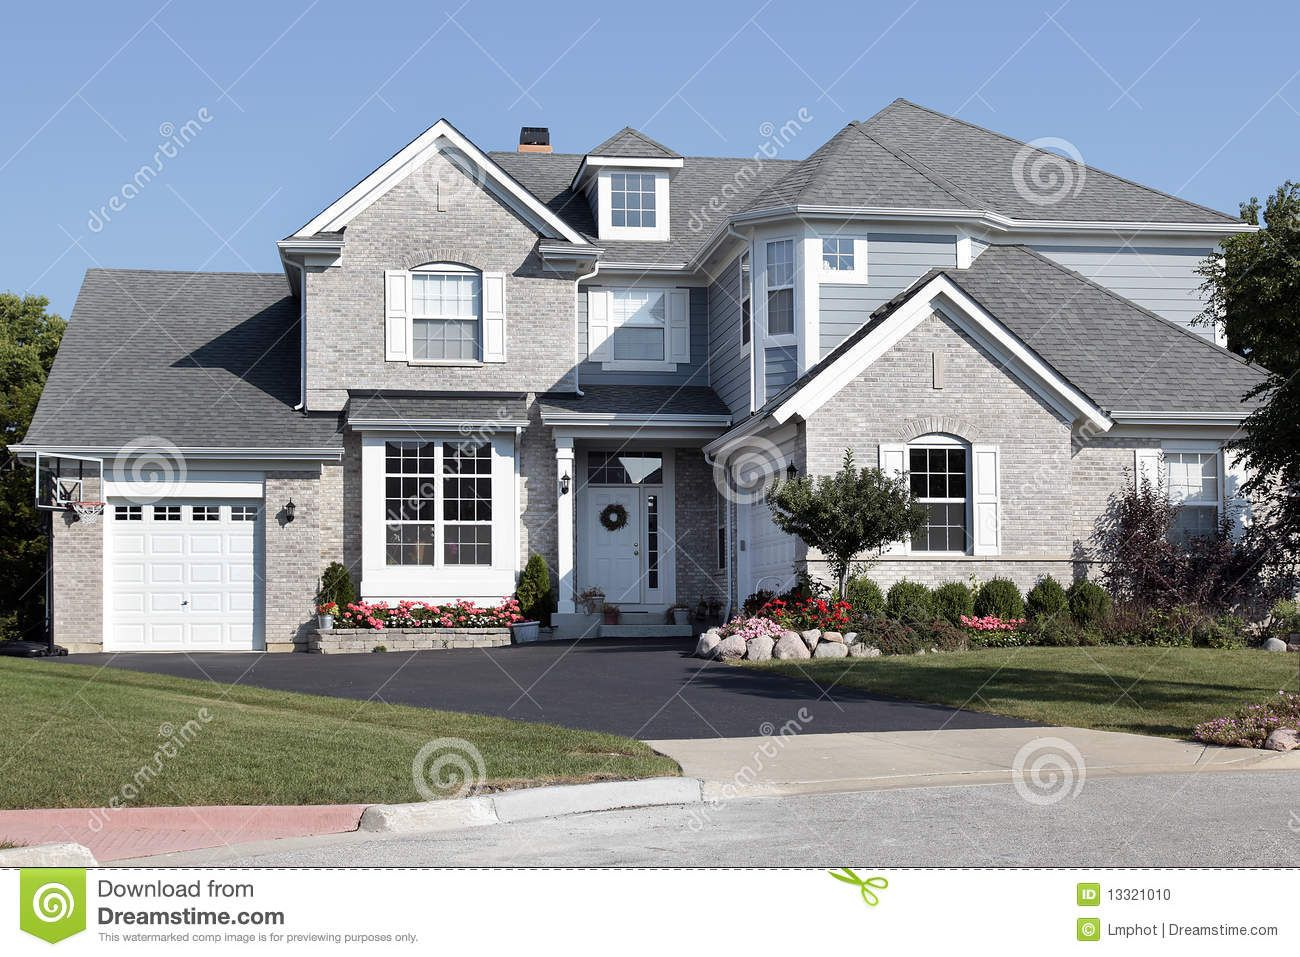 Siding Brick Combination Brick Exterior House Blue Siding Grey Brick Houses